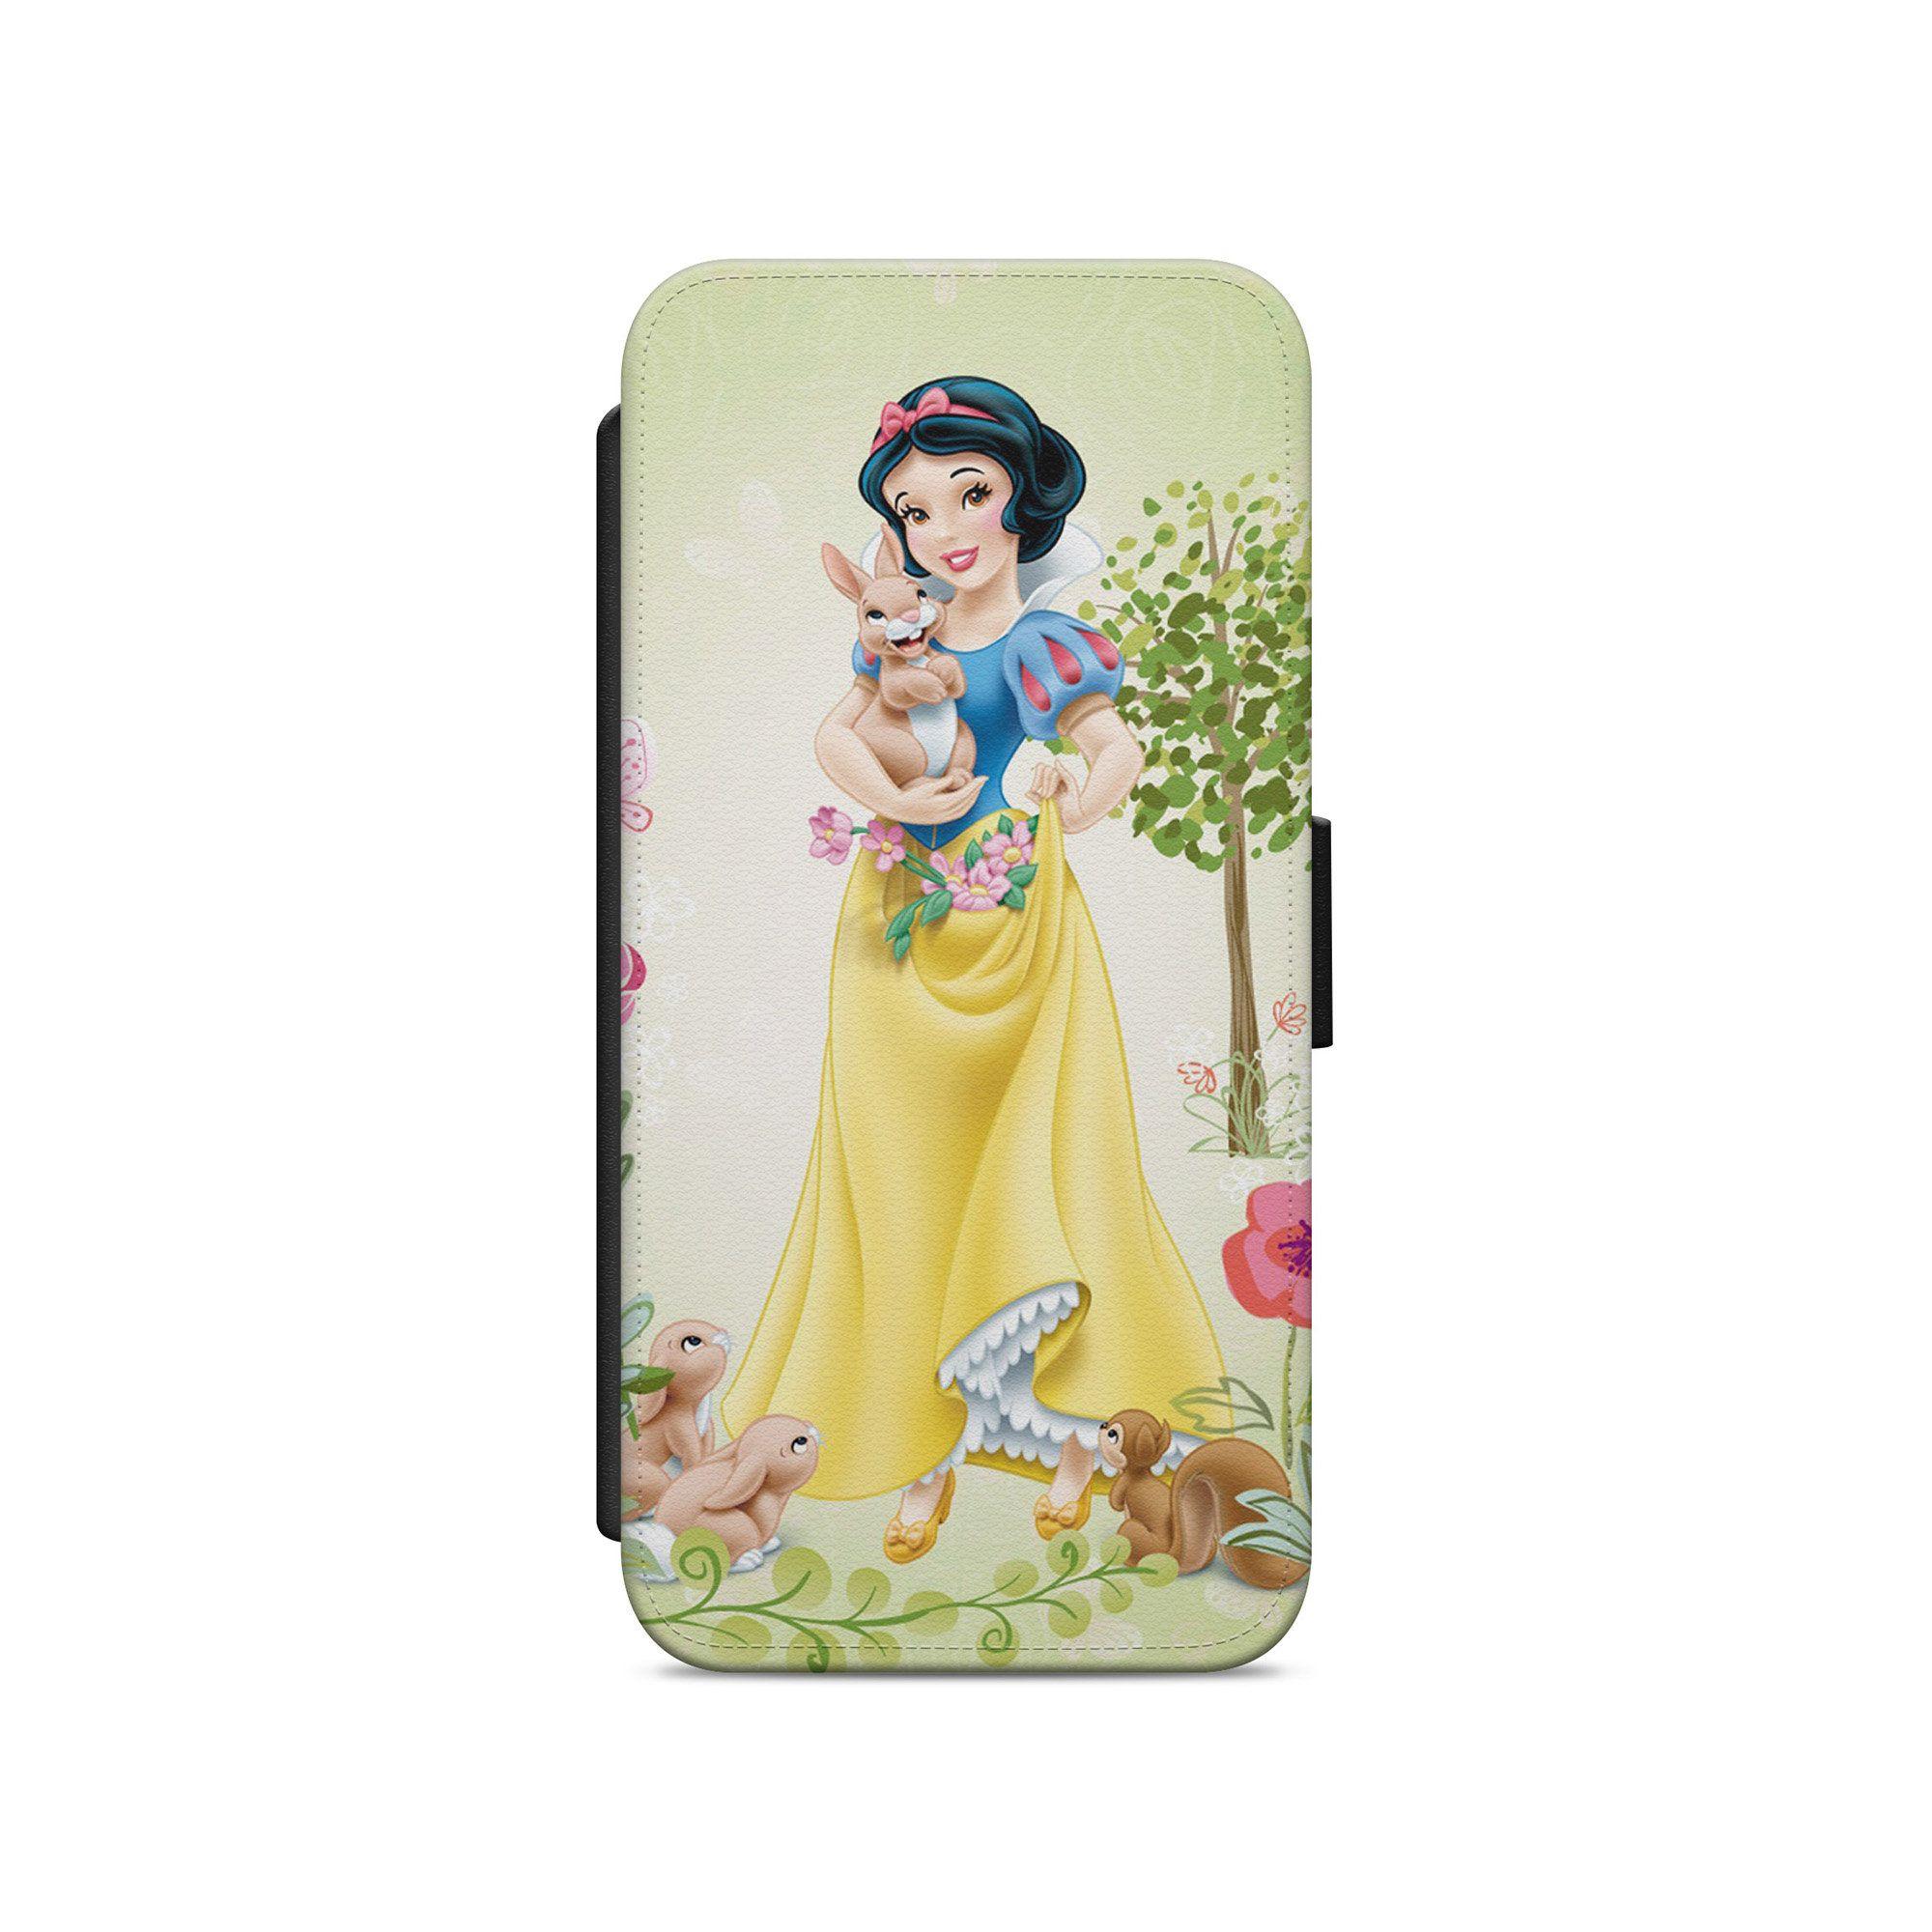 Disney Princess FLIP PHONE CASE COVER